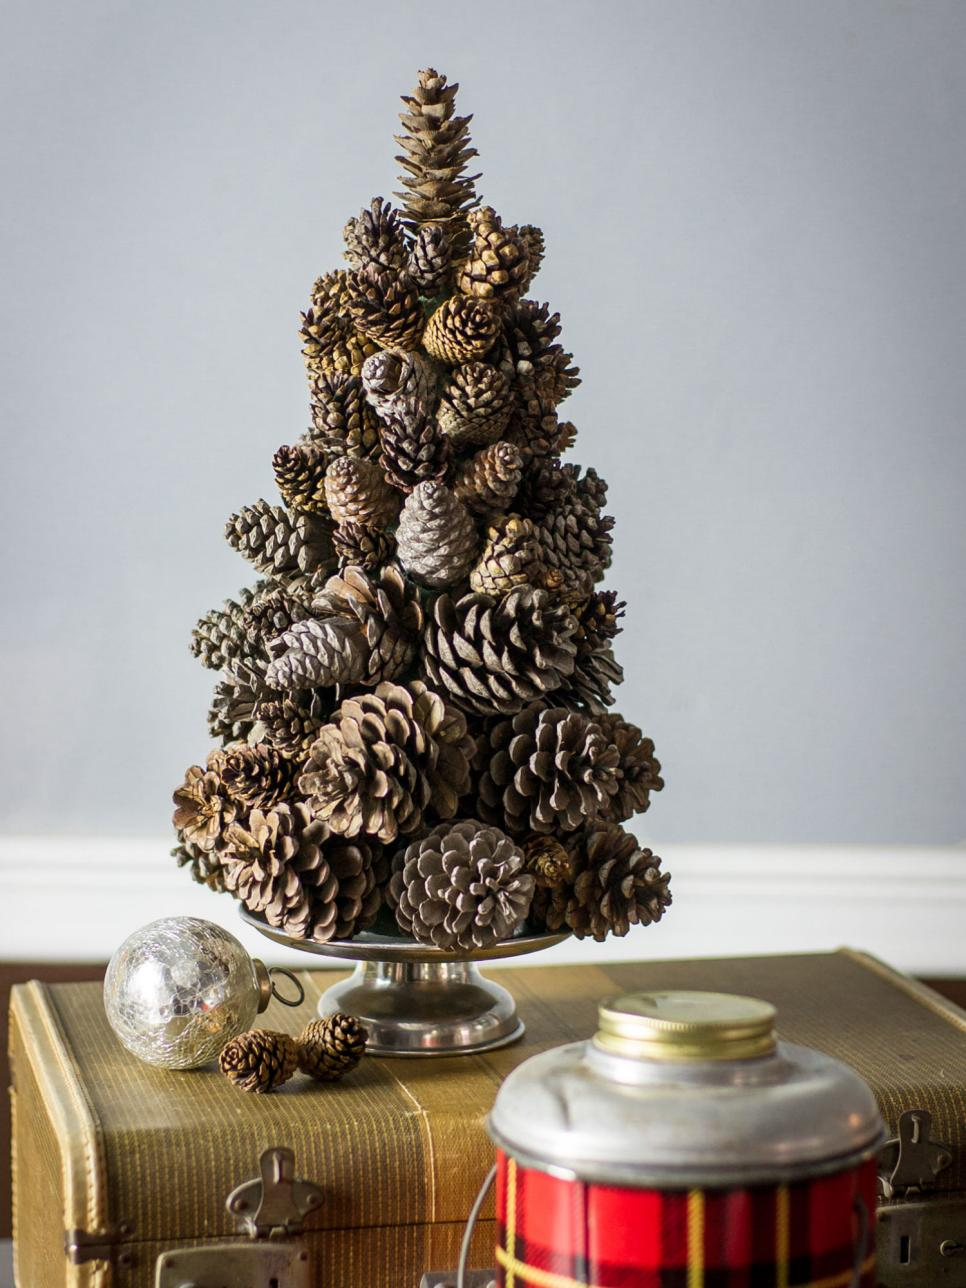 10 DIY Winter Decorations - pinecone tree